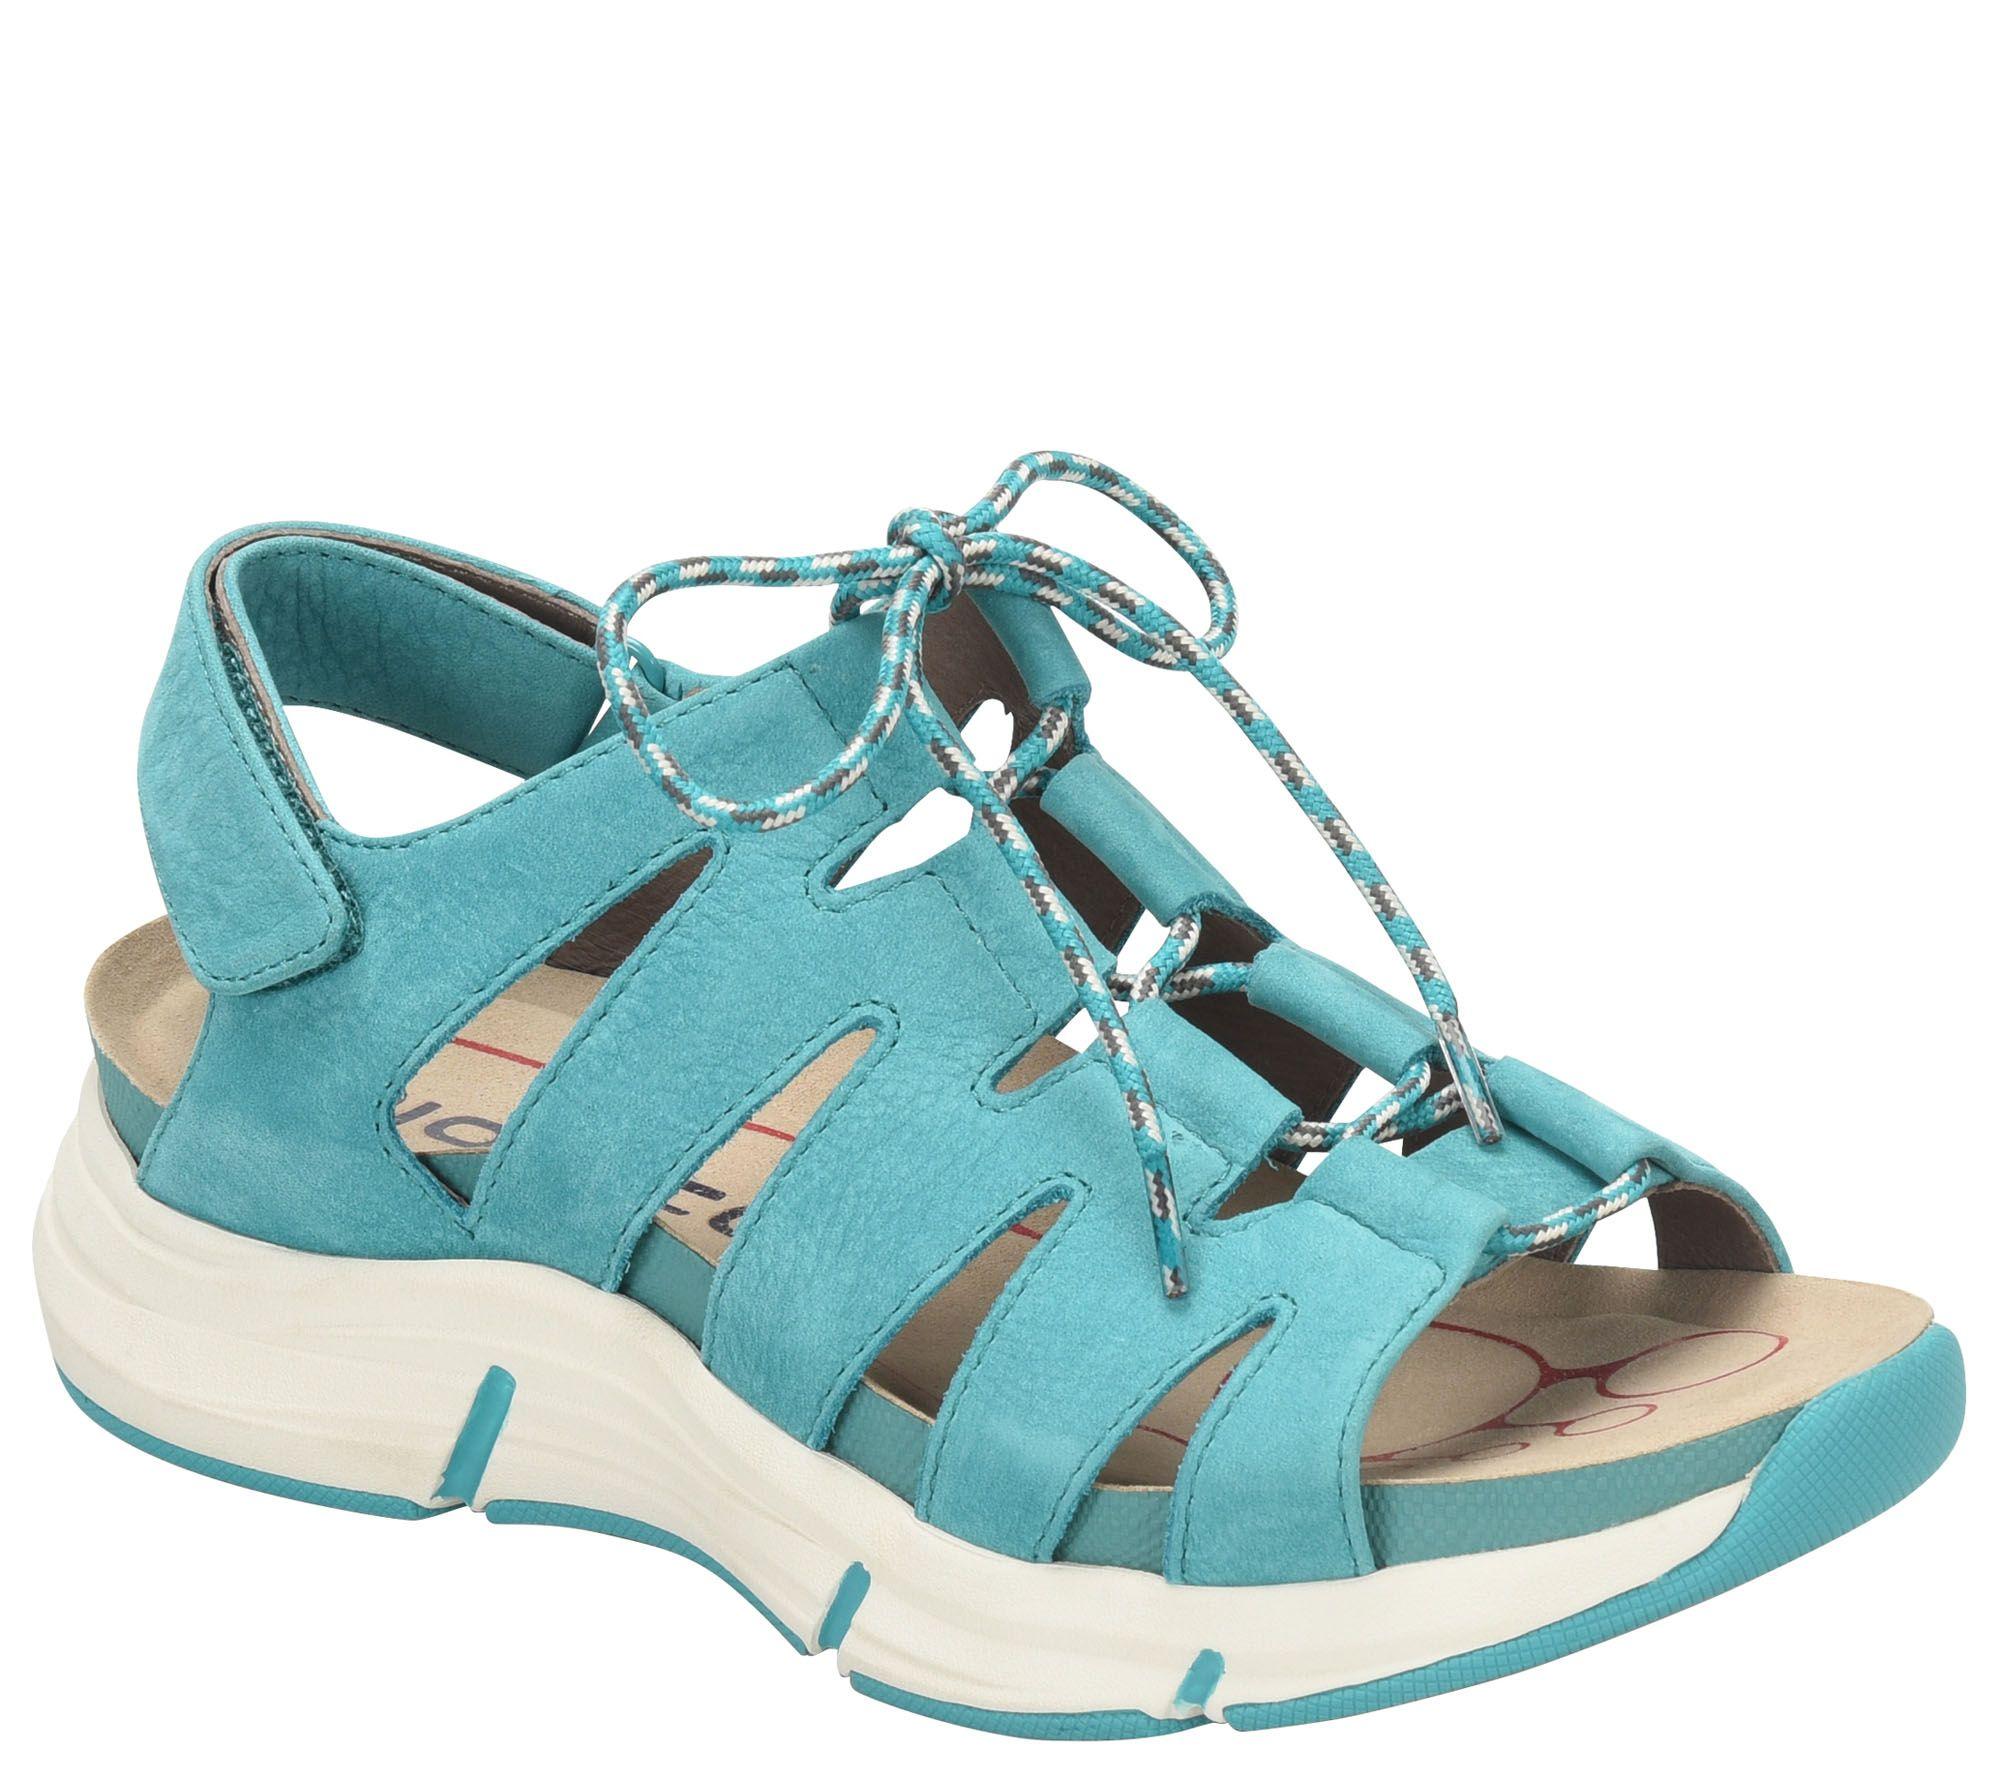 c774110634aeaa Bionica Lace-up Sandals - Olanda - Page 1 — QVC.com